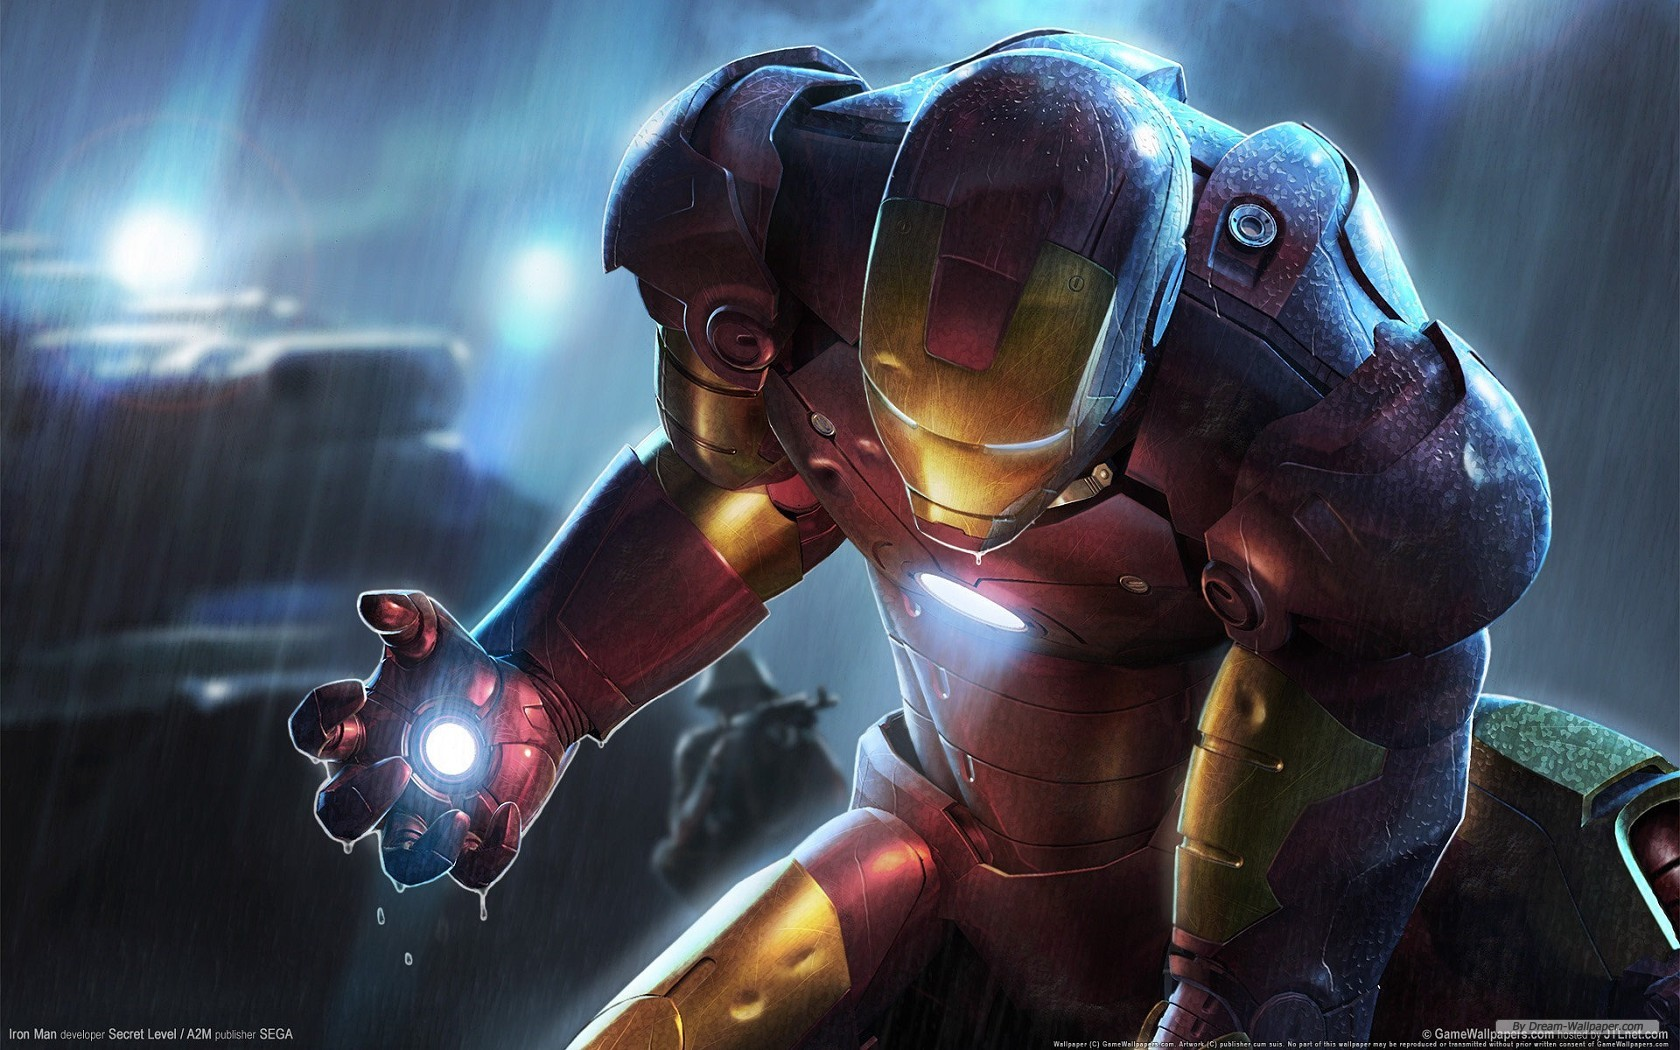 Free download Iron Man 3 Wallpaper 1080pHD Wallpapers